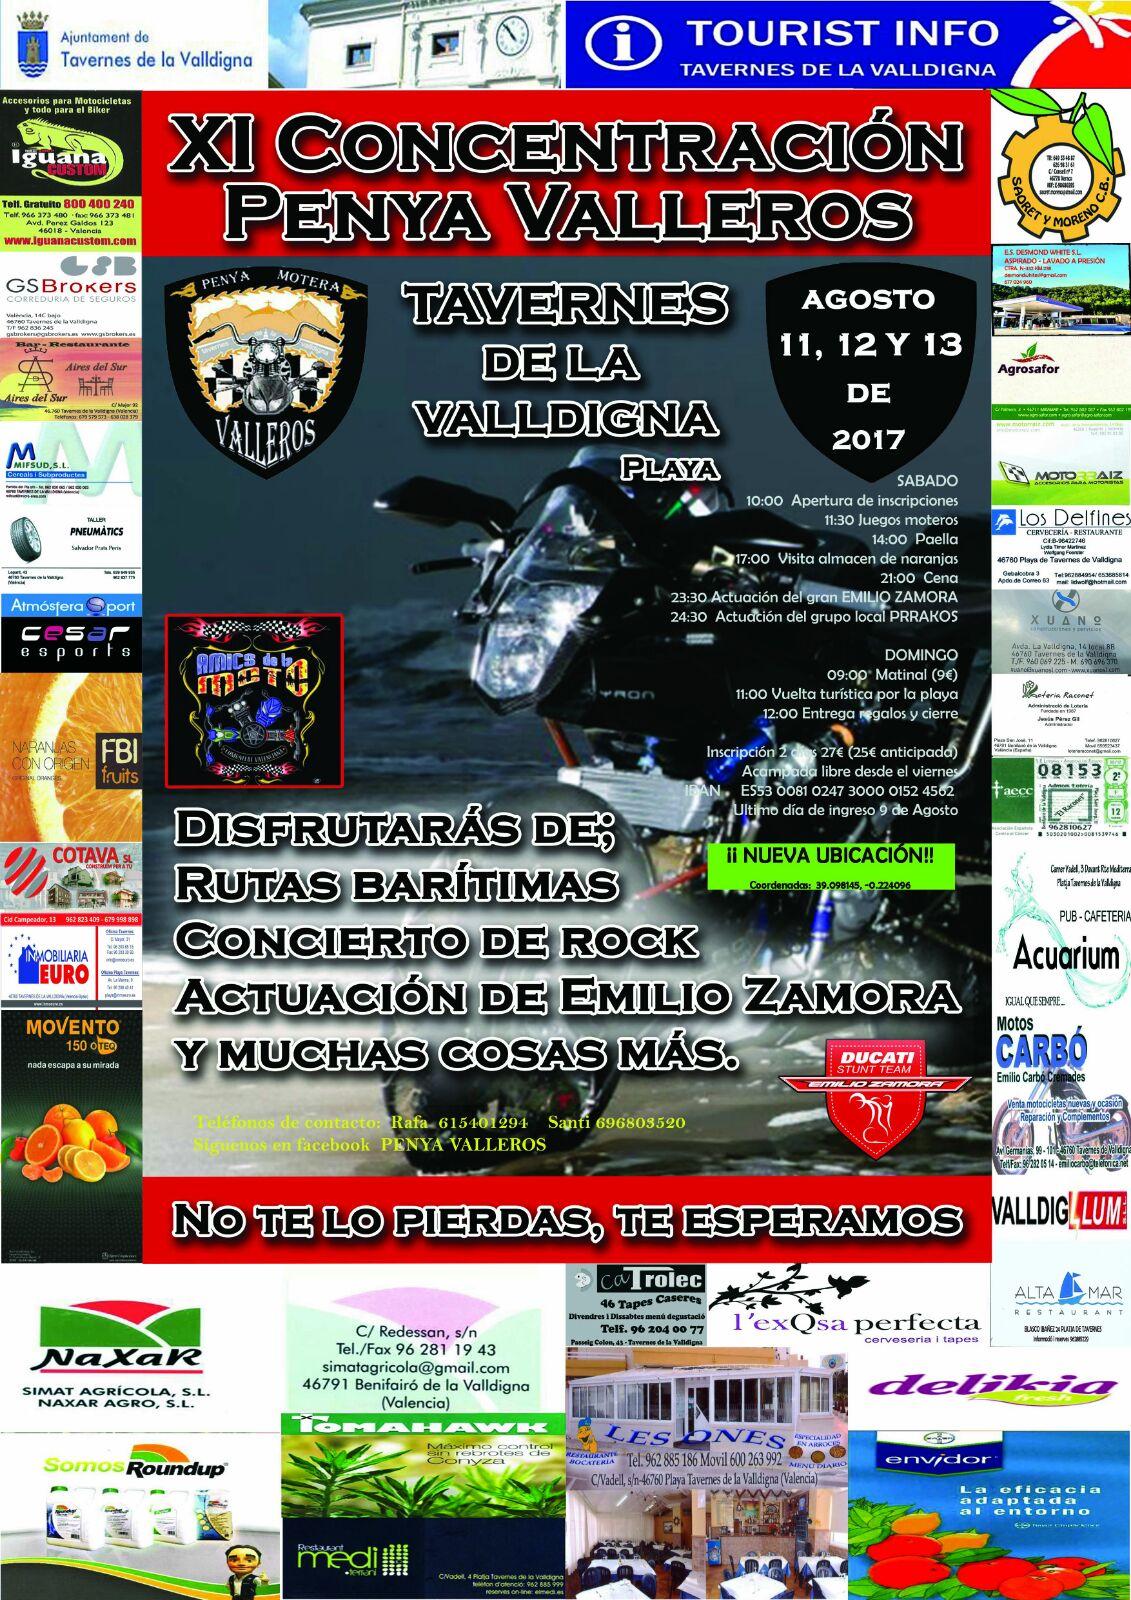 CONCENTRACION PENYA VALLEROS_TAVERNES DE LA VALLDIGNA_2017_EMILIO_ZAMORA_DUCATI_STUNT_SHOW_MOTOR_TEAM_ESPECTACULO_MOTOCICLISMO_QUAD